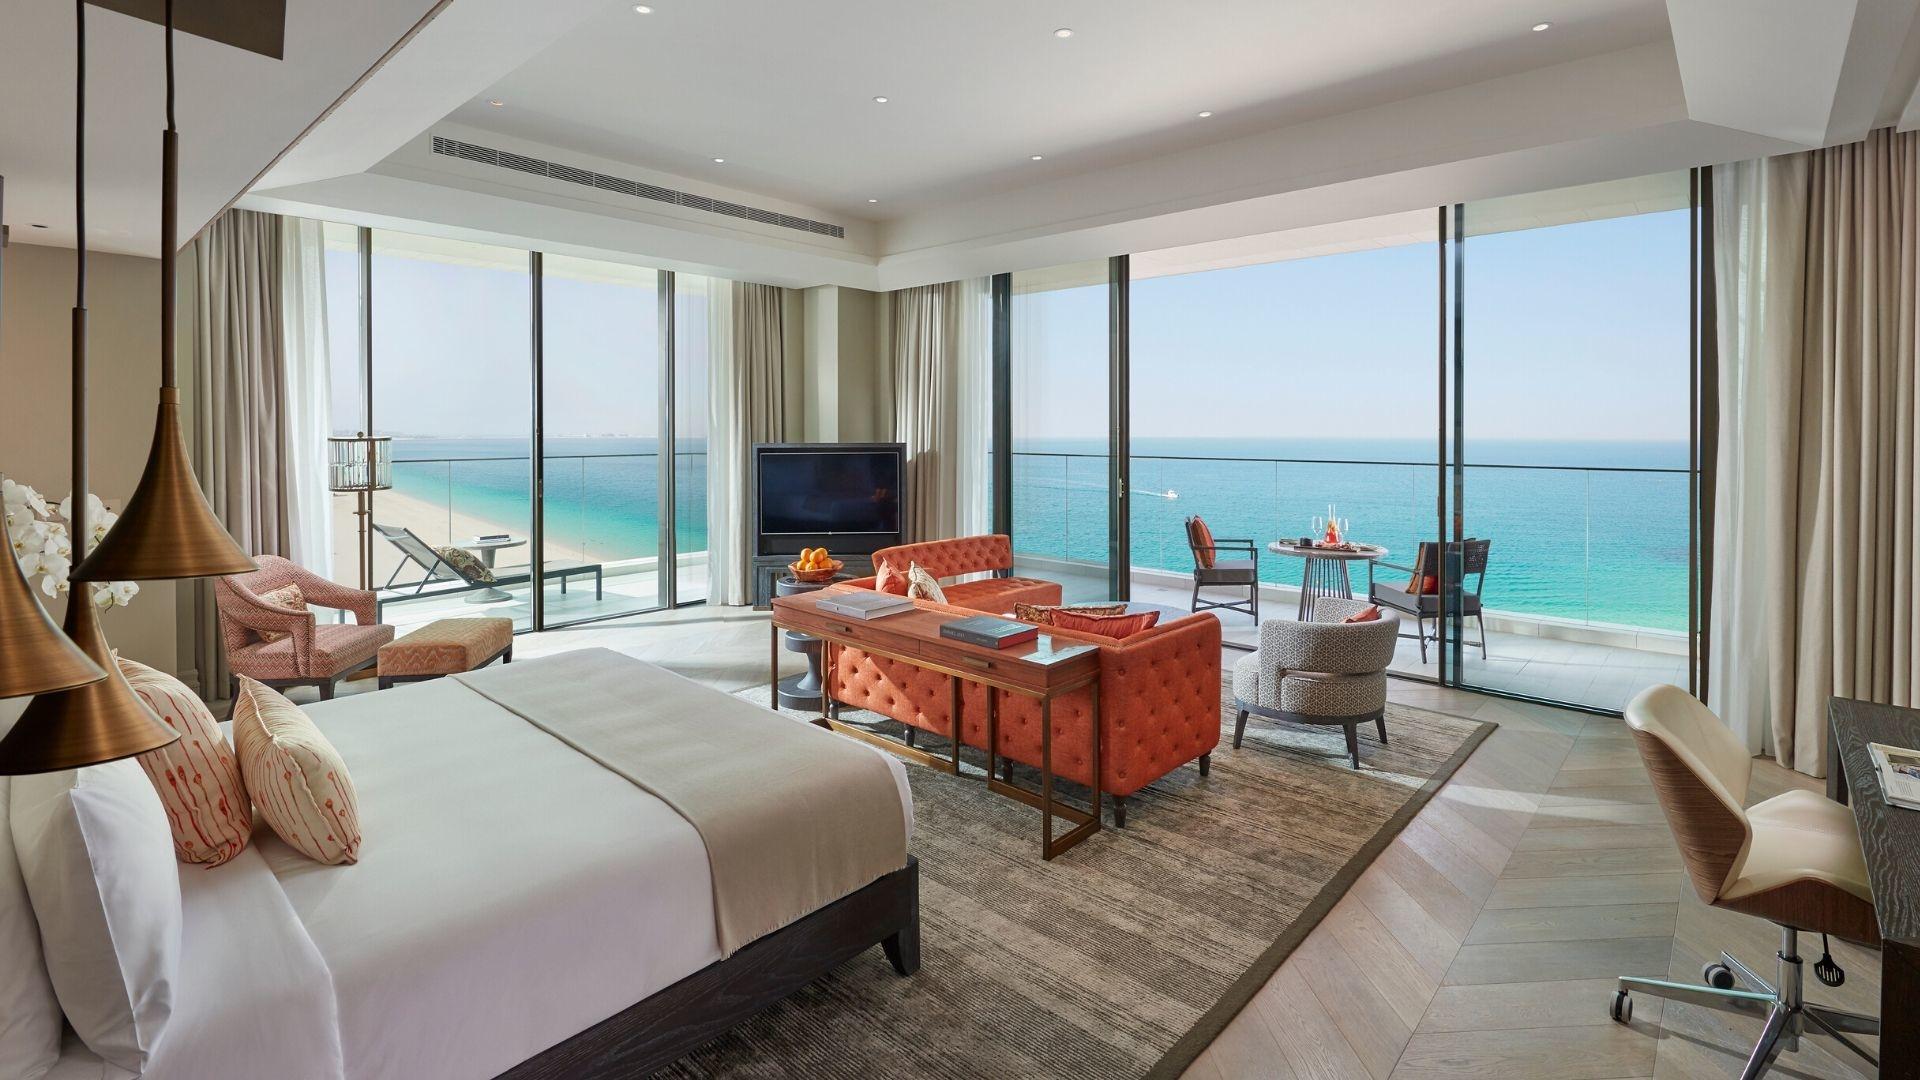 The Escape   Suite Dreams At The Mandarin Oriental Jumeira, Dubai